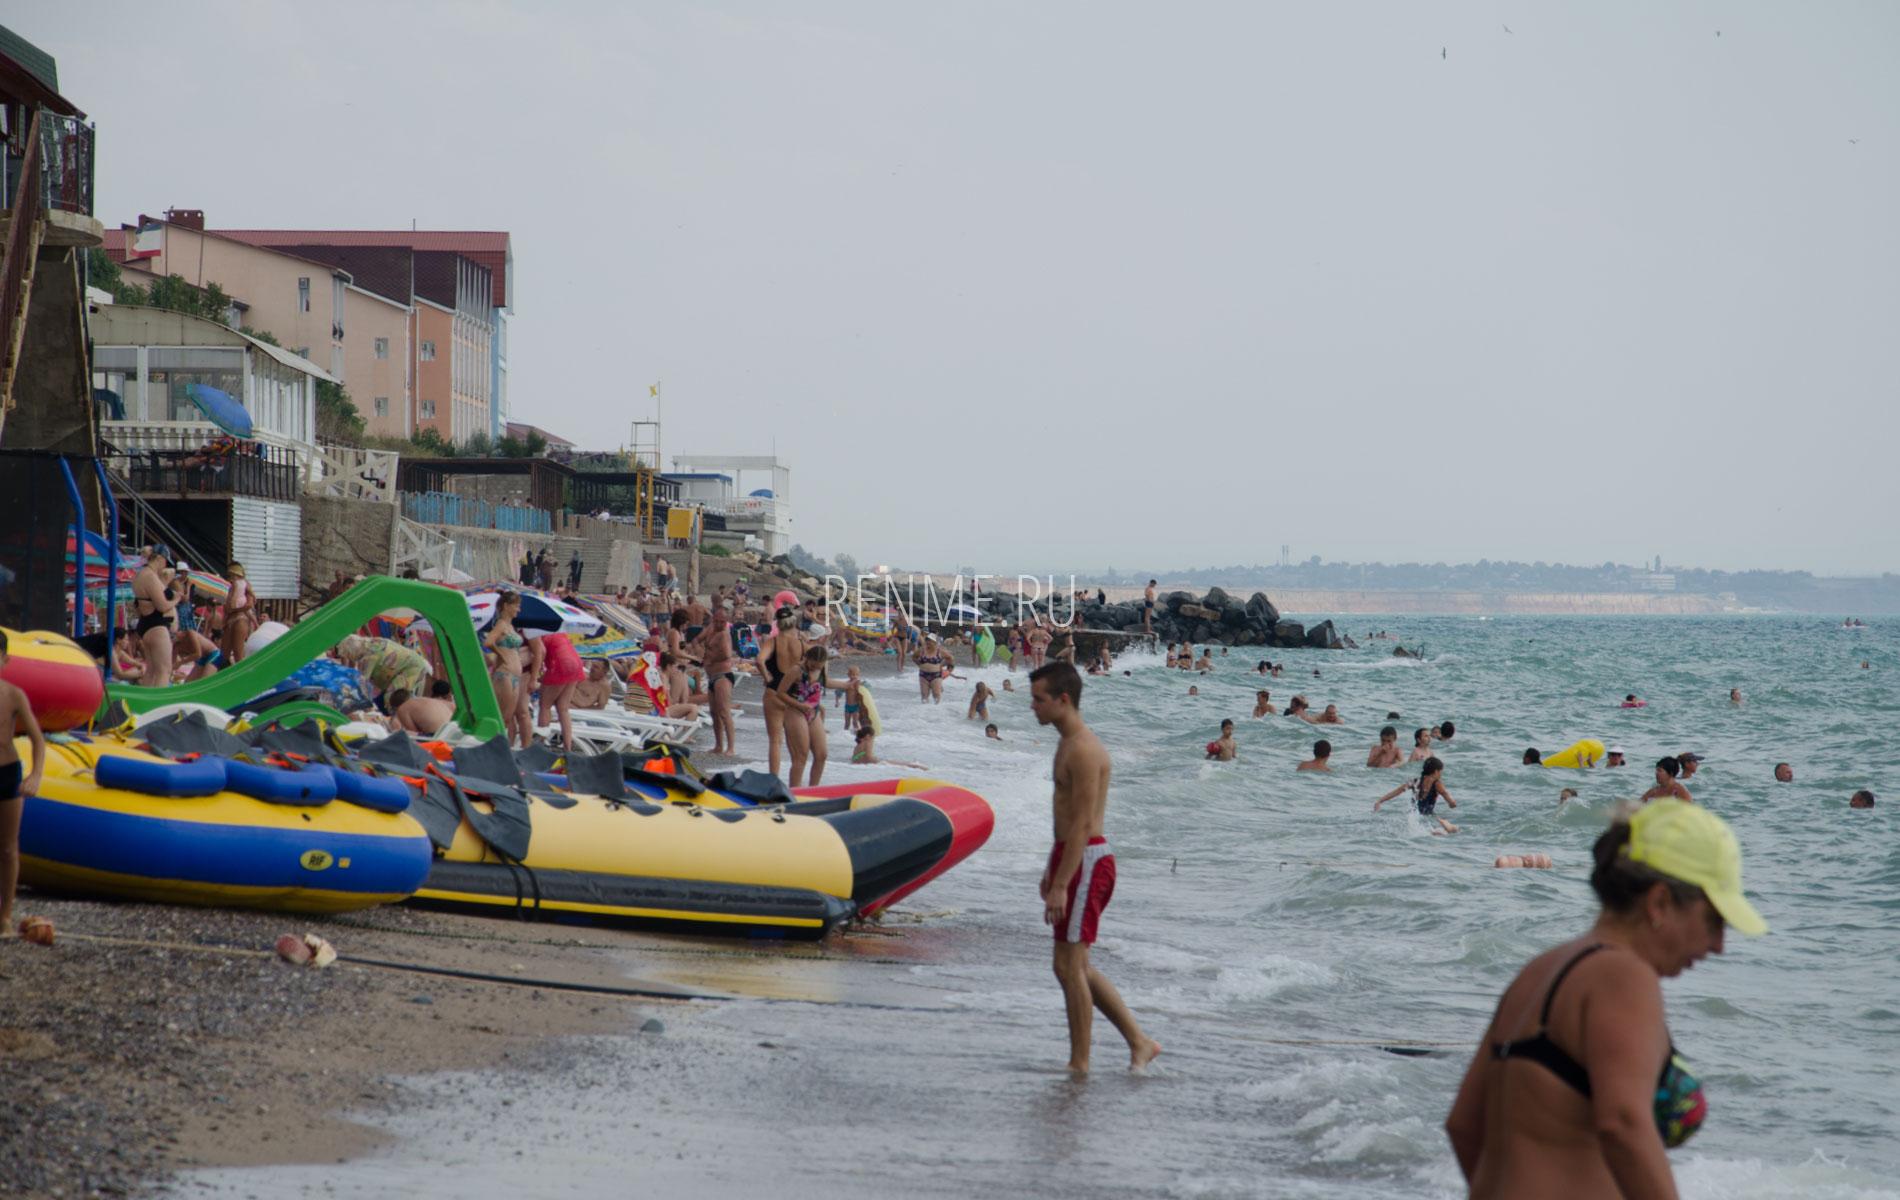 Развлечения на пляже летом. Фото Николаевки